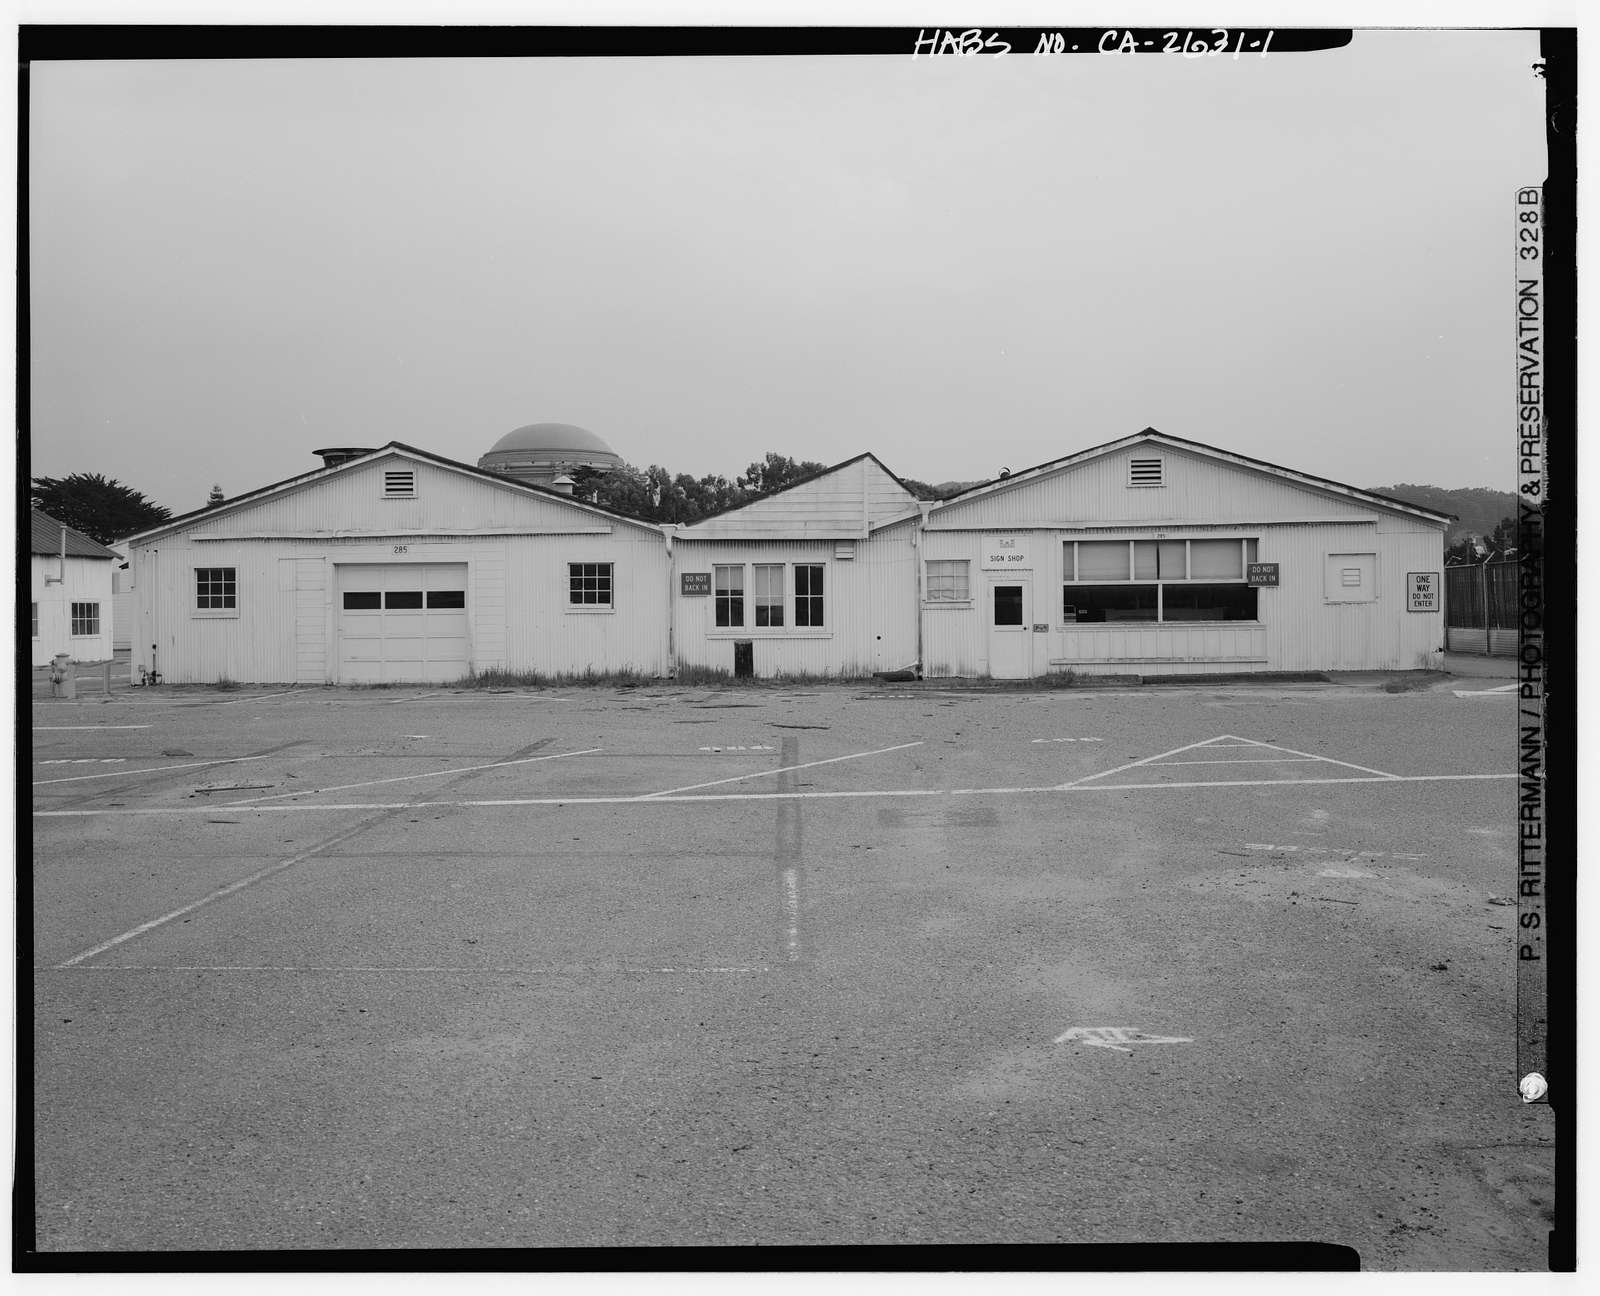 Presidio of San Francisco, Paint Shop, Crissy Field North cantonment, San Francisco, San Francisco County, CA